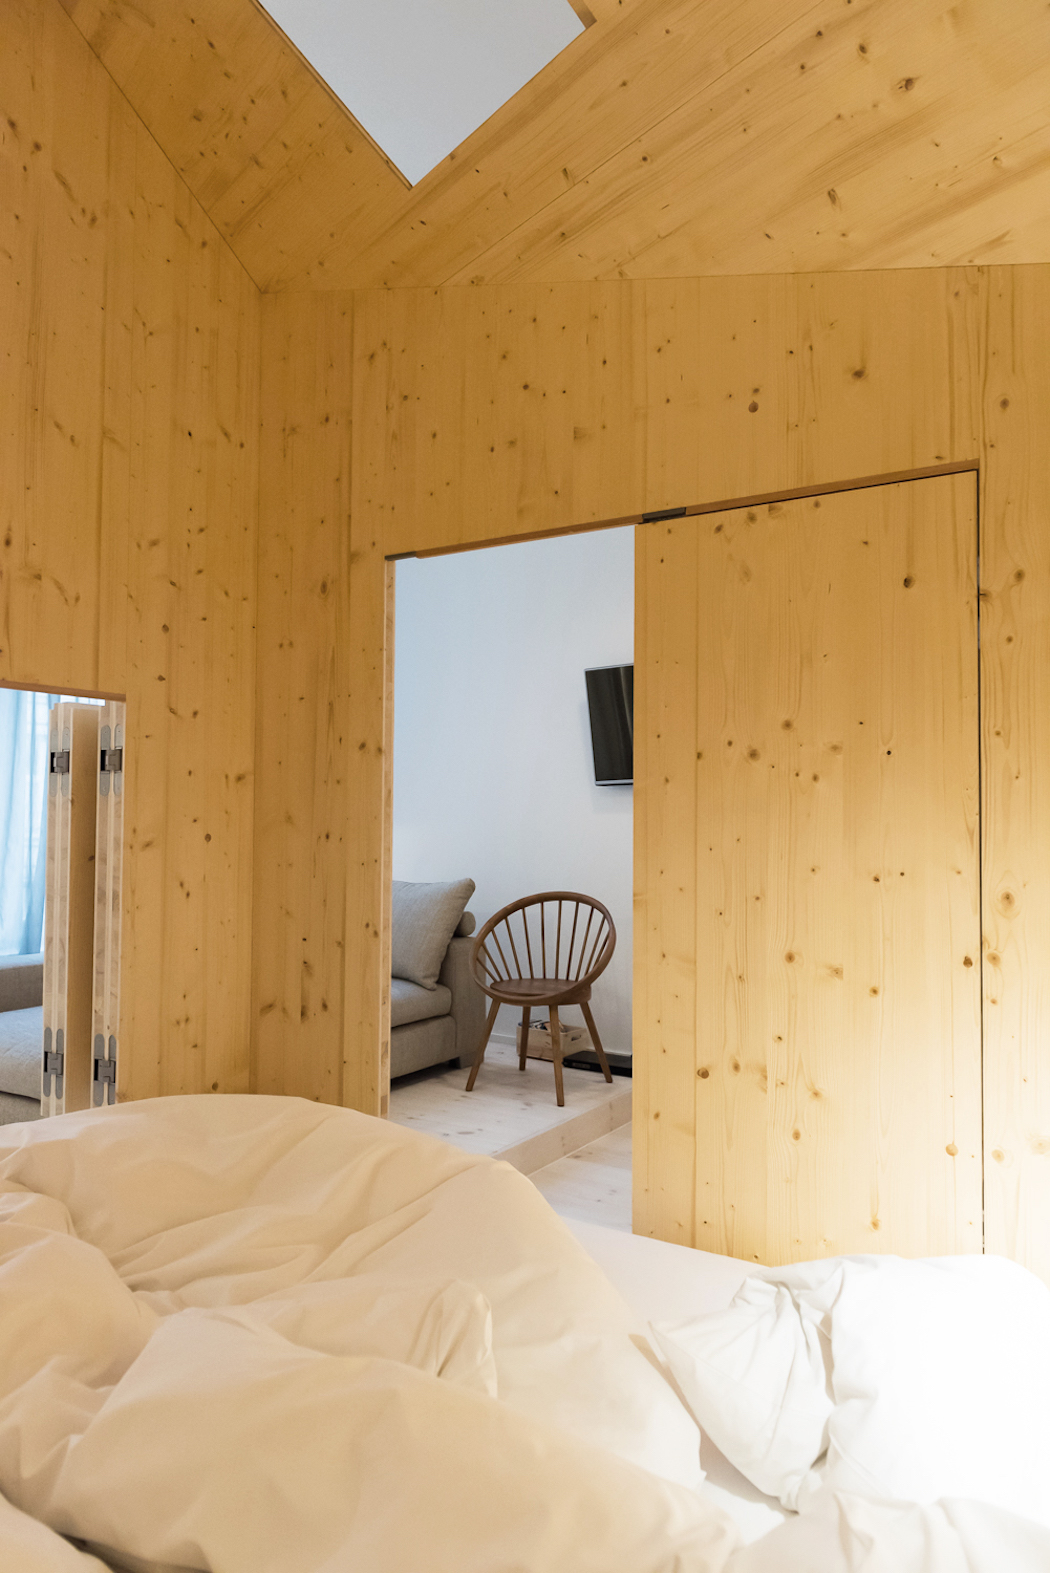 Room 304_Sigurd Larsen_Michelberger Hotel_Architecture Danish design berlin_photo x James Pfaff 7